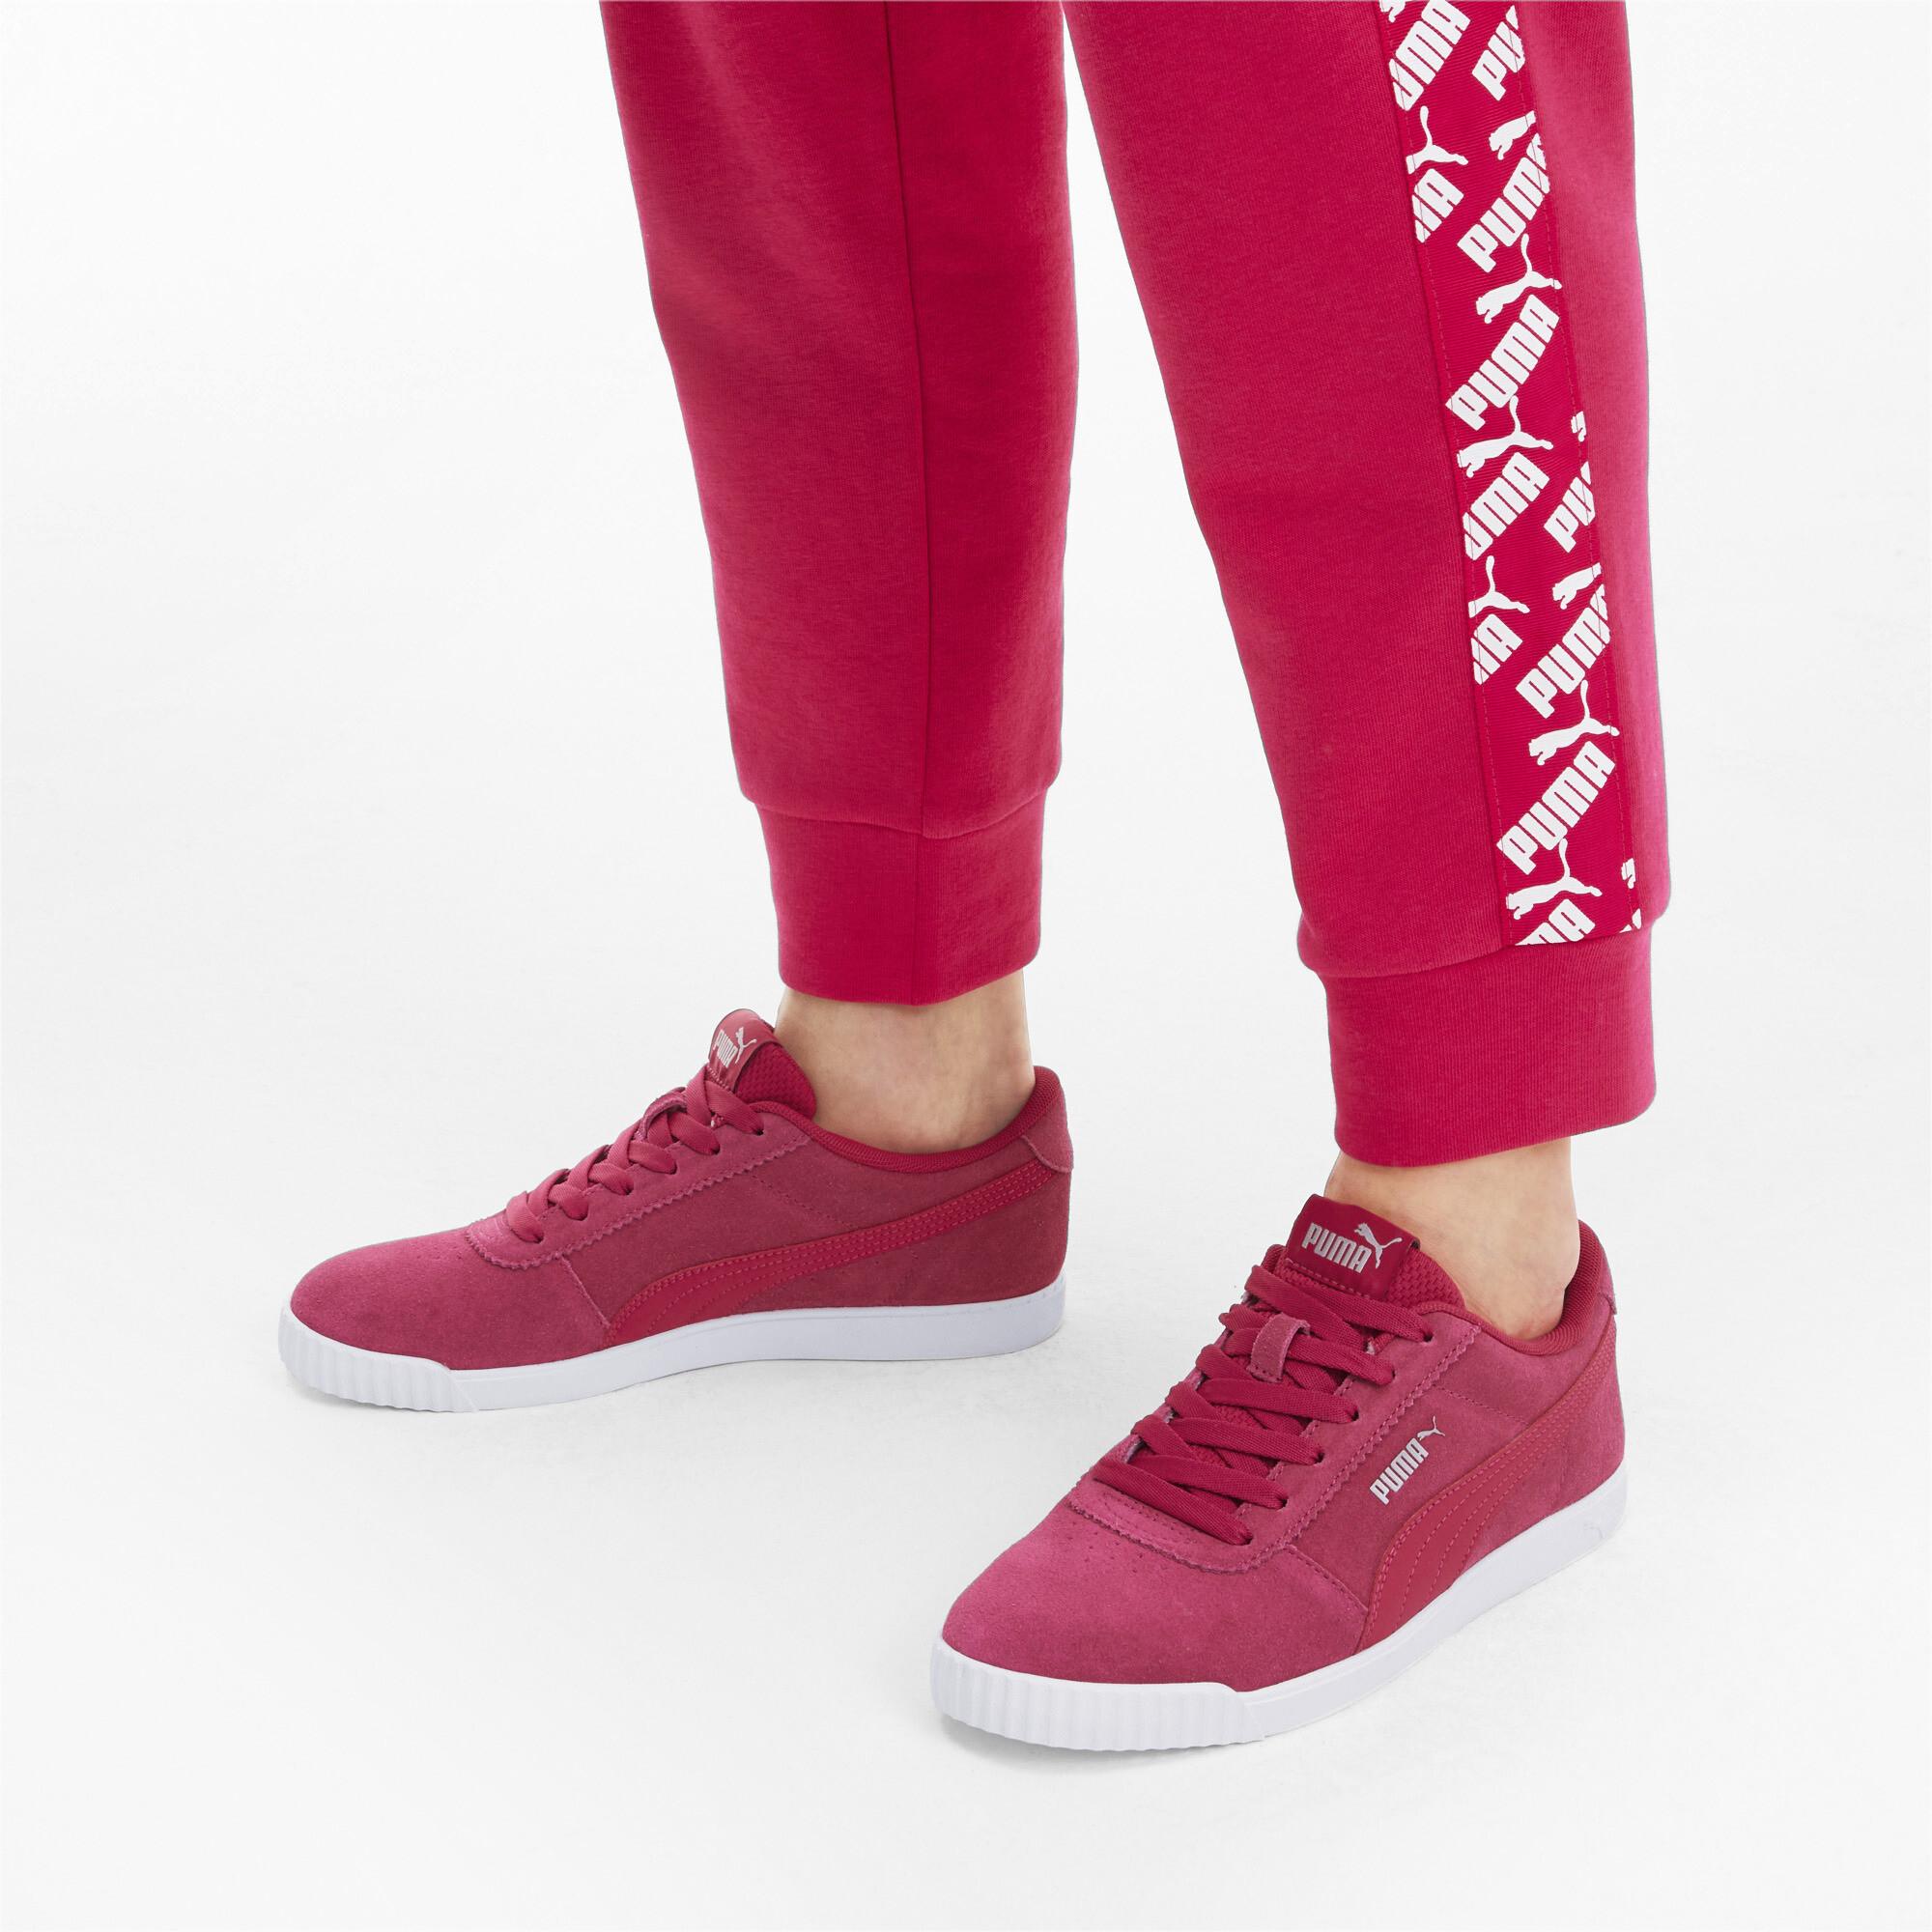 PUMA-Women-039-s-Carina-Slim-Suede-Sneakers thumbnail 12